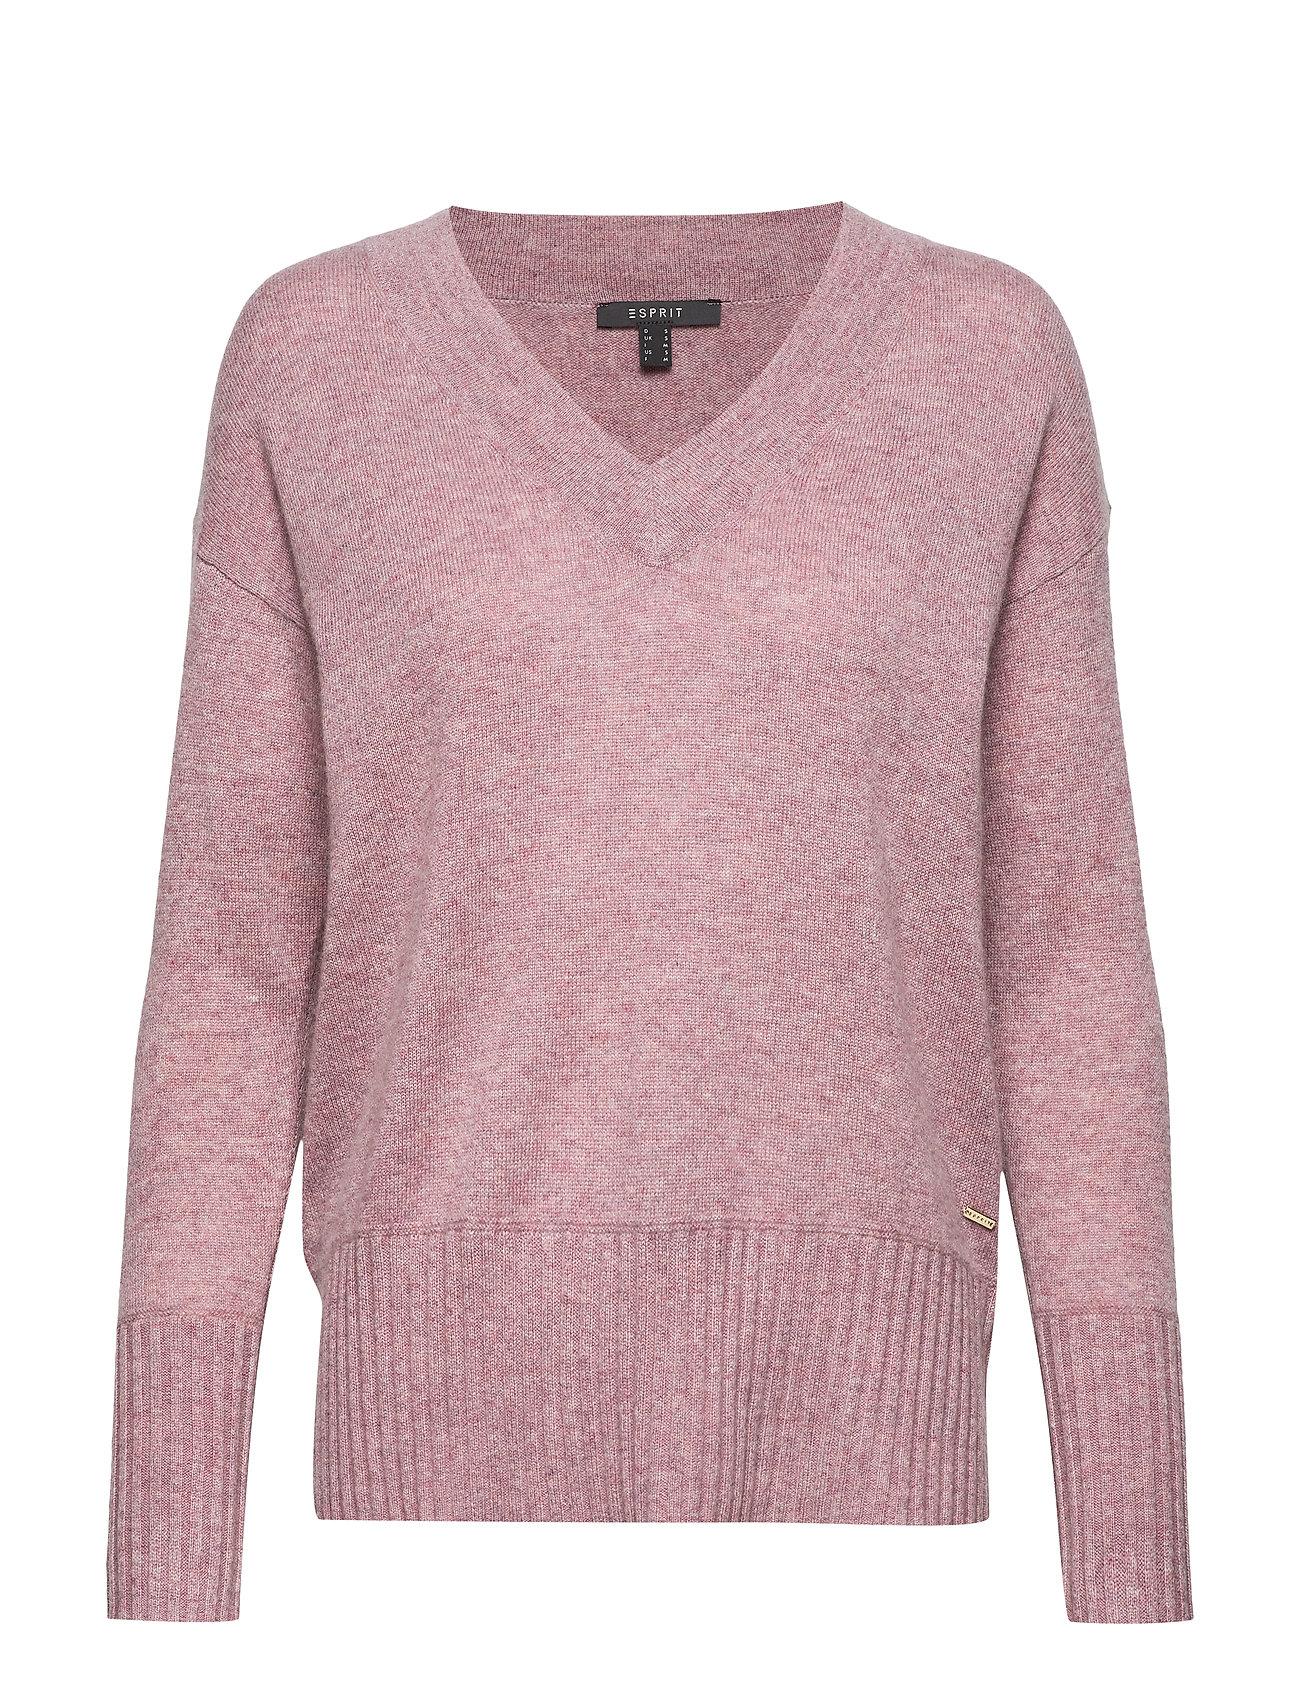 ESPRIT Sweaters Strickpullover Pink ESPRIT COLLECTION